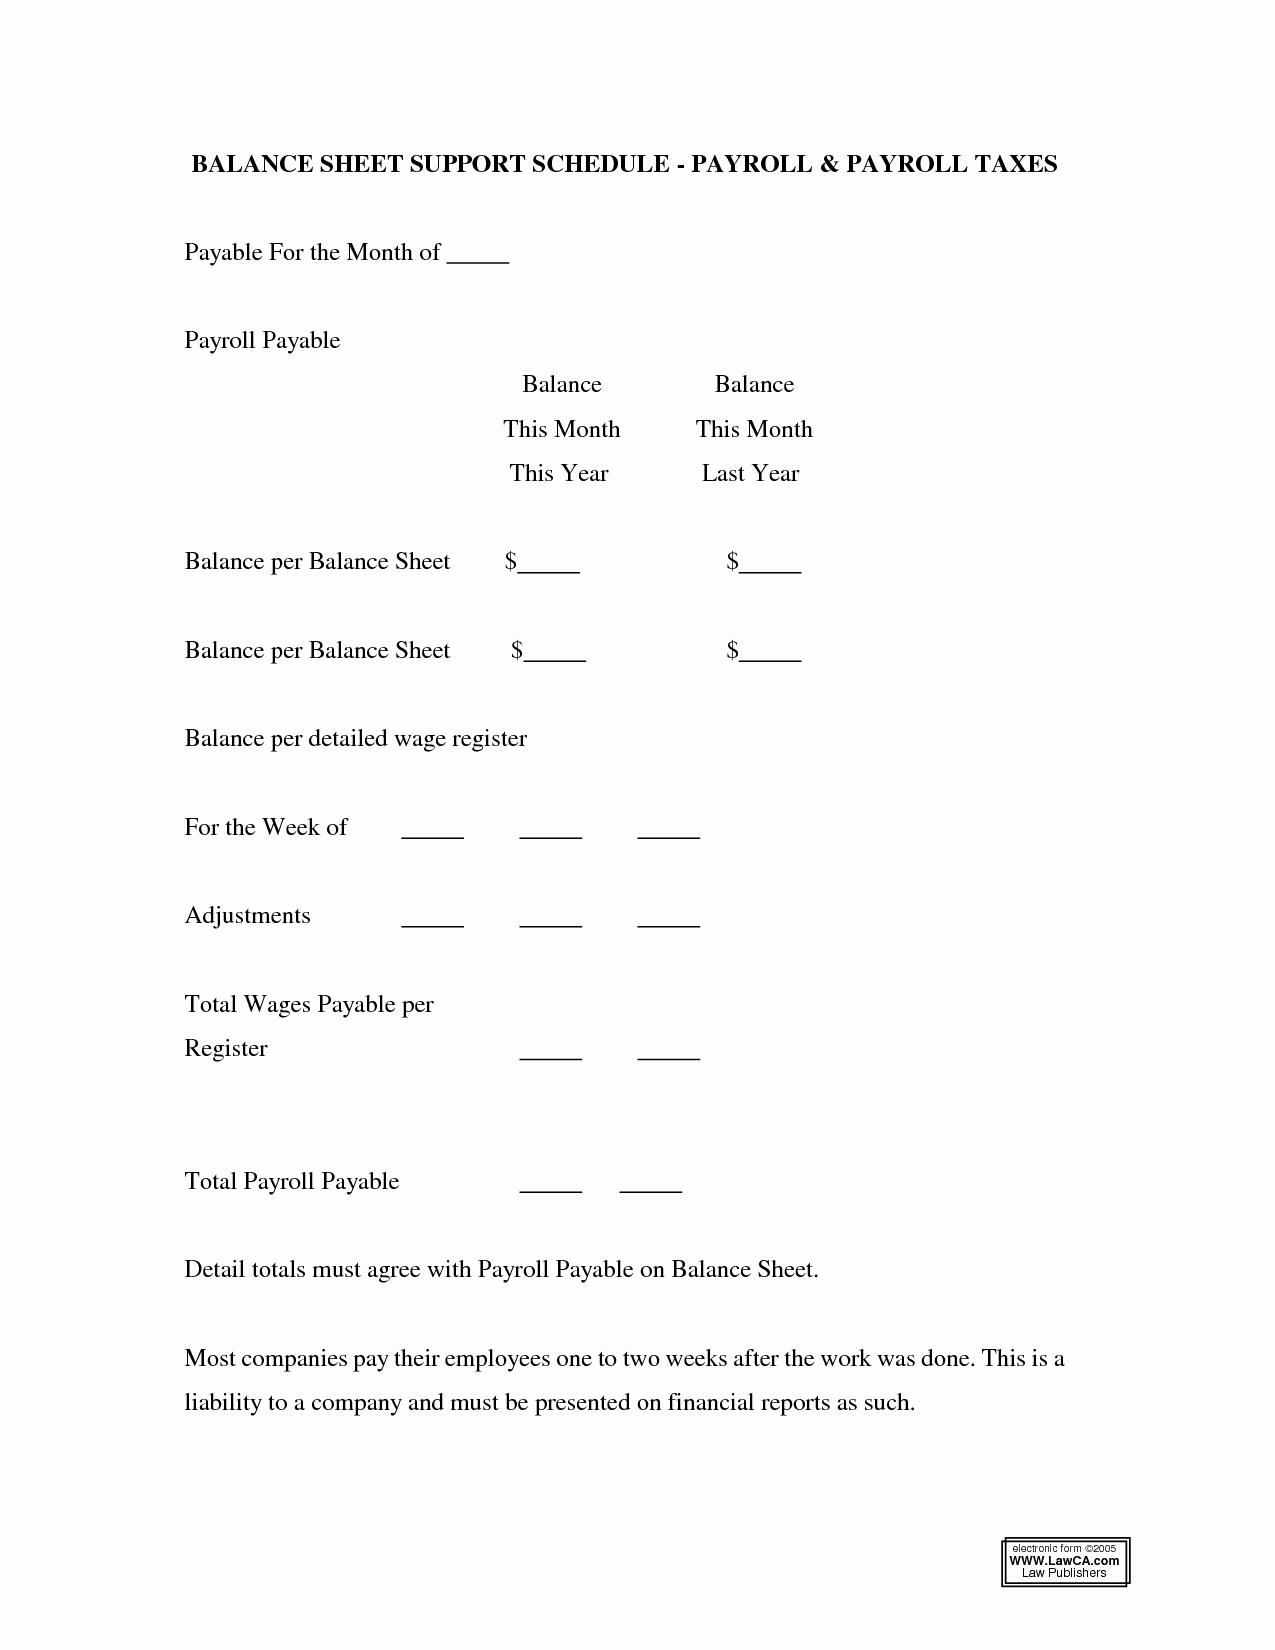 Real Estate Balance Sheet Template New Best S Of Real Estate Balance Sheet Template Sample